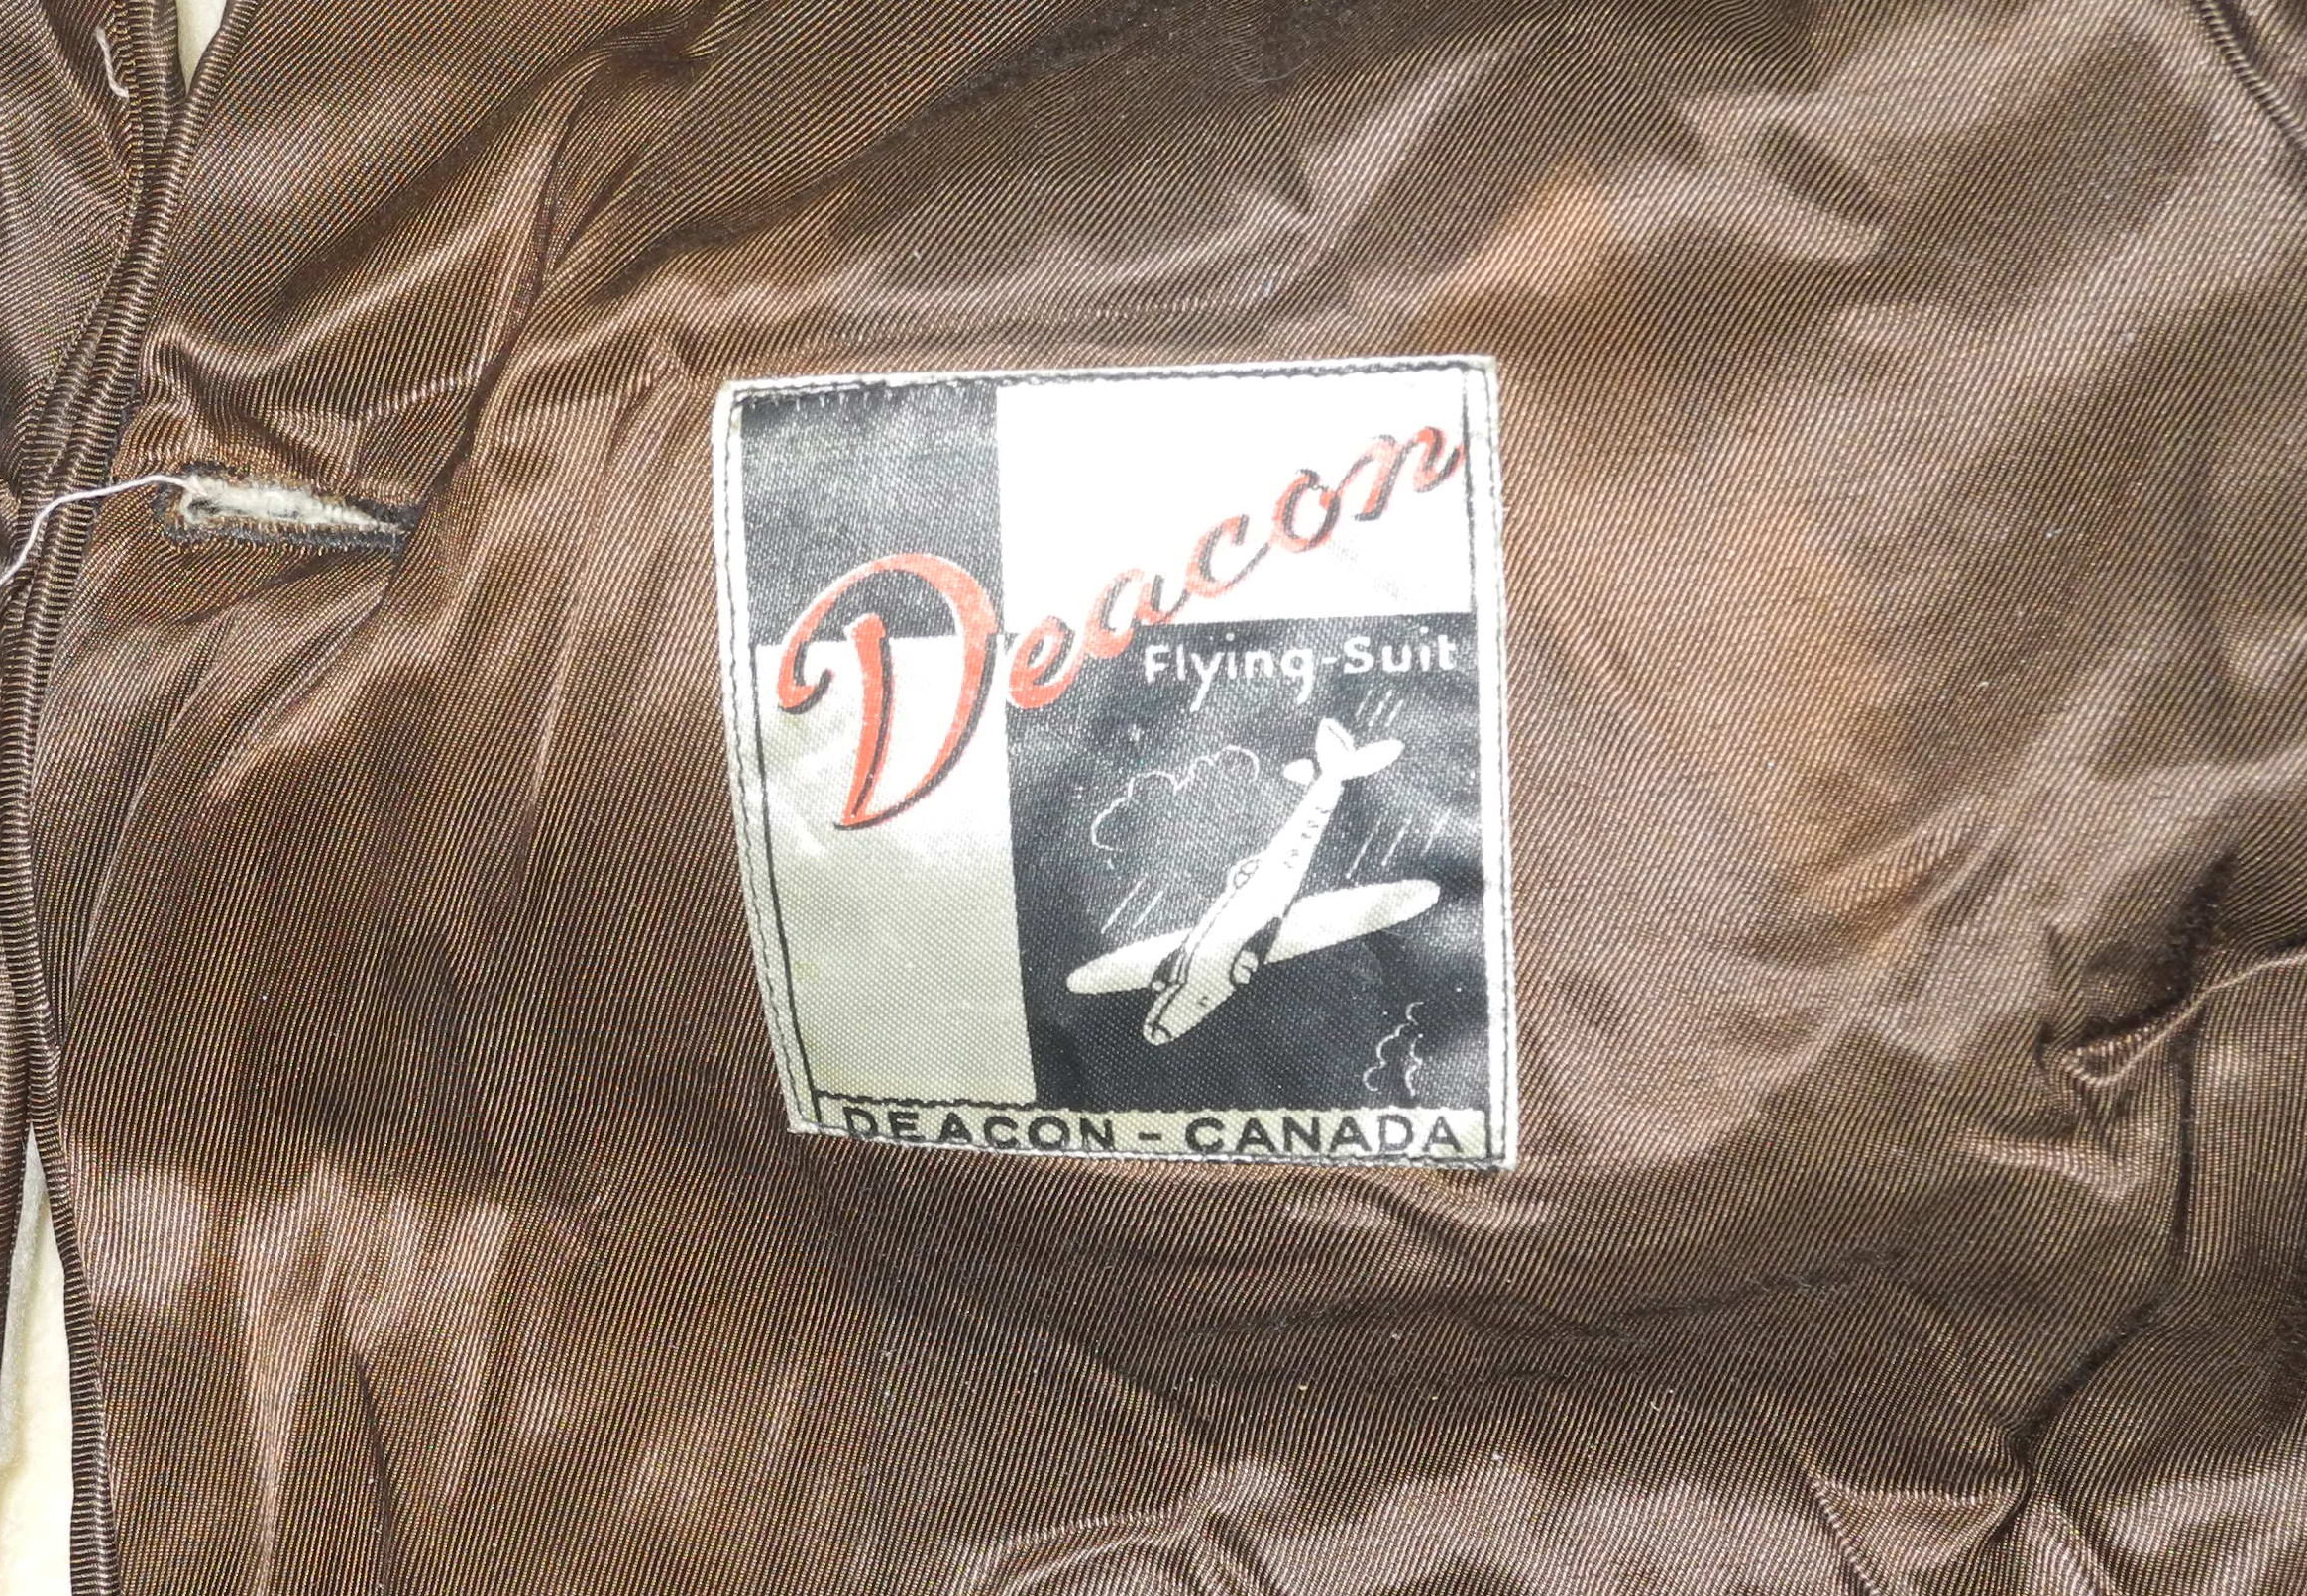 RCAF flying suit liner